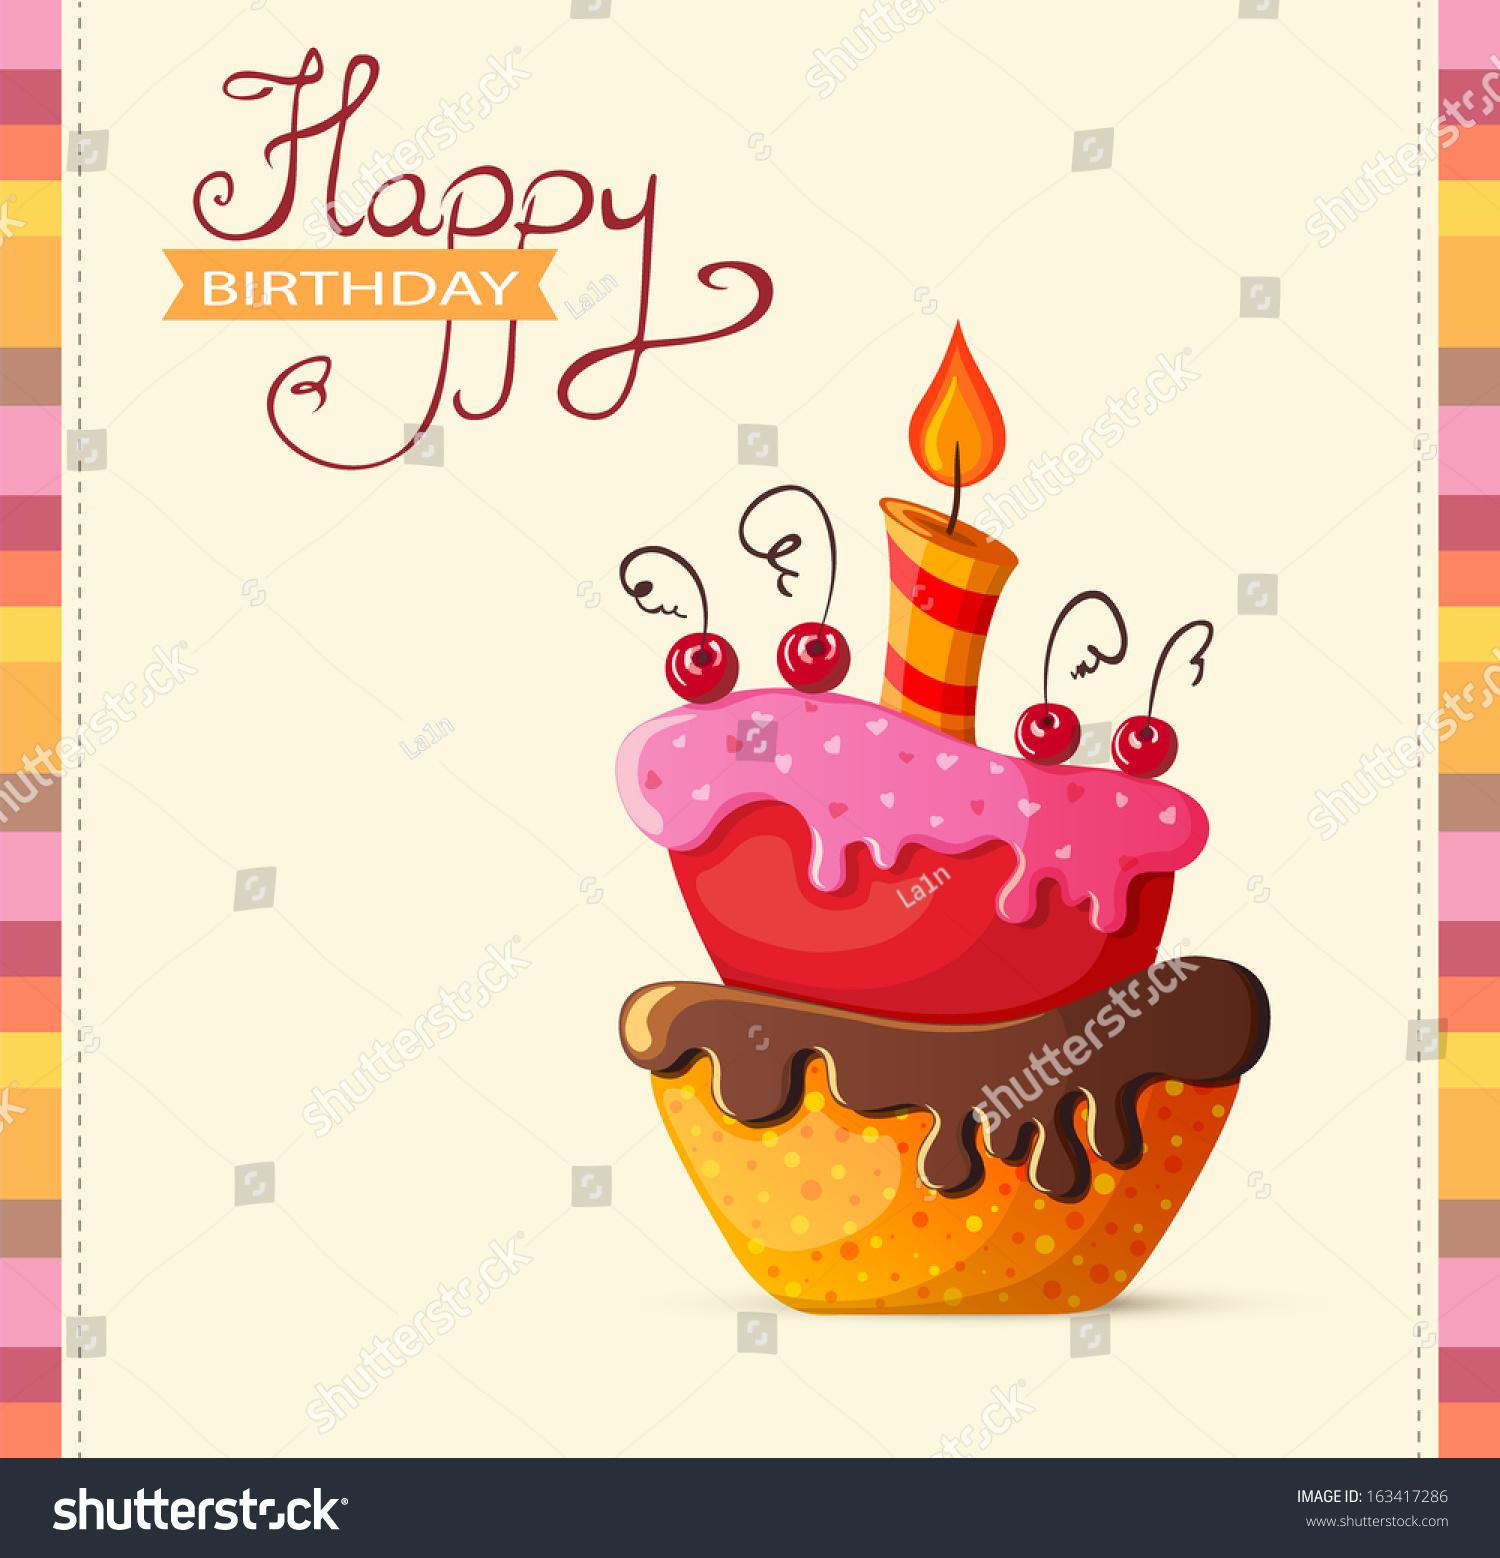 Birthday Card Cake Illustration Stock Vector 163417286 Shutterstock